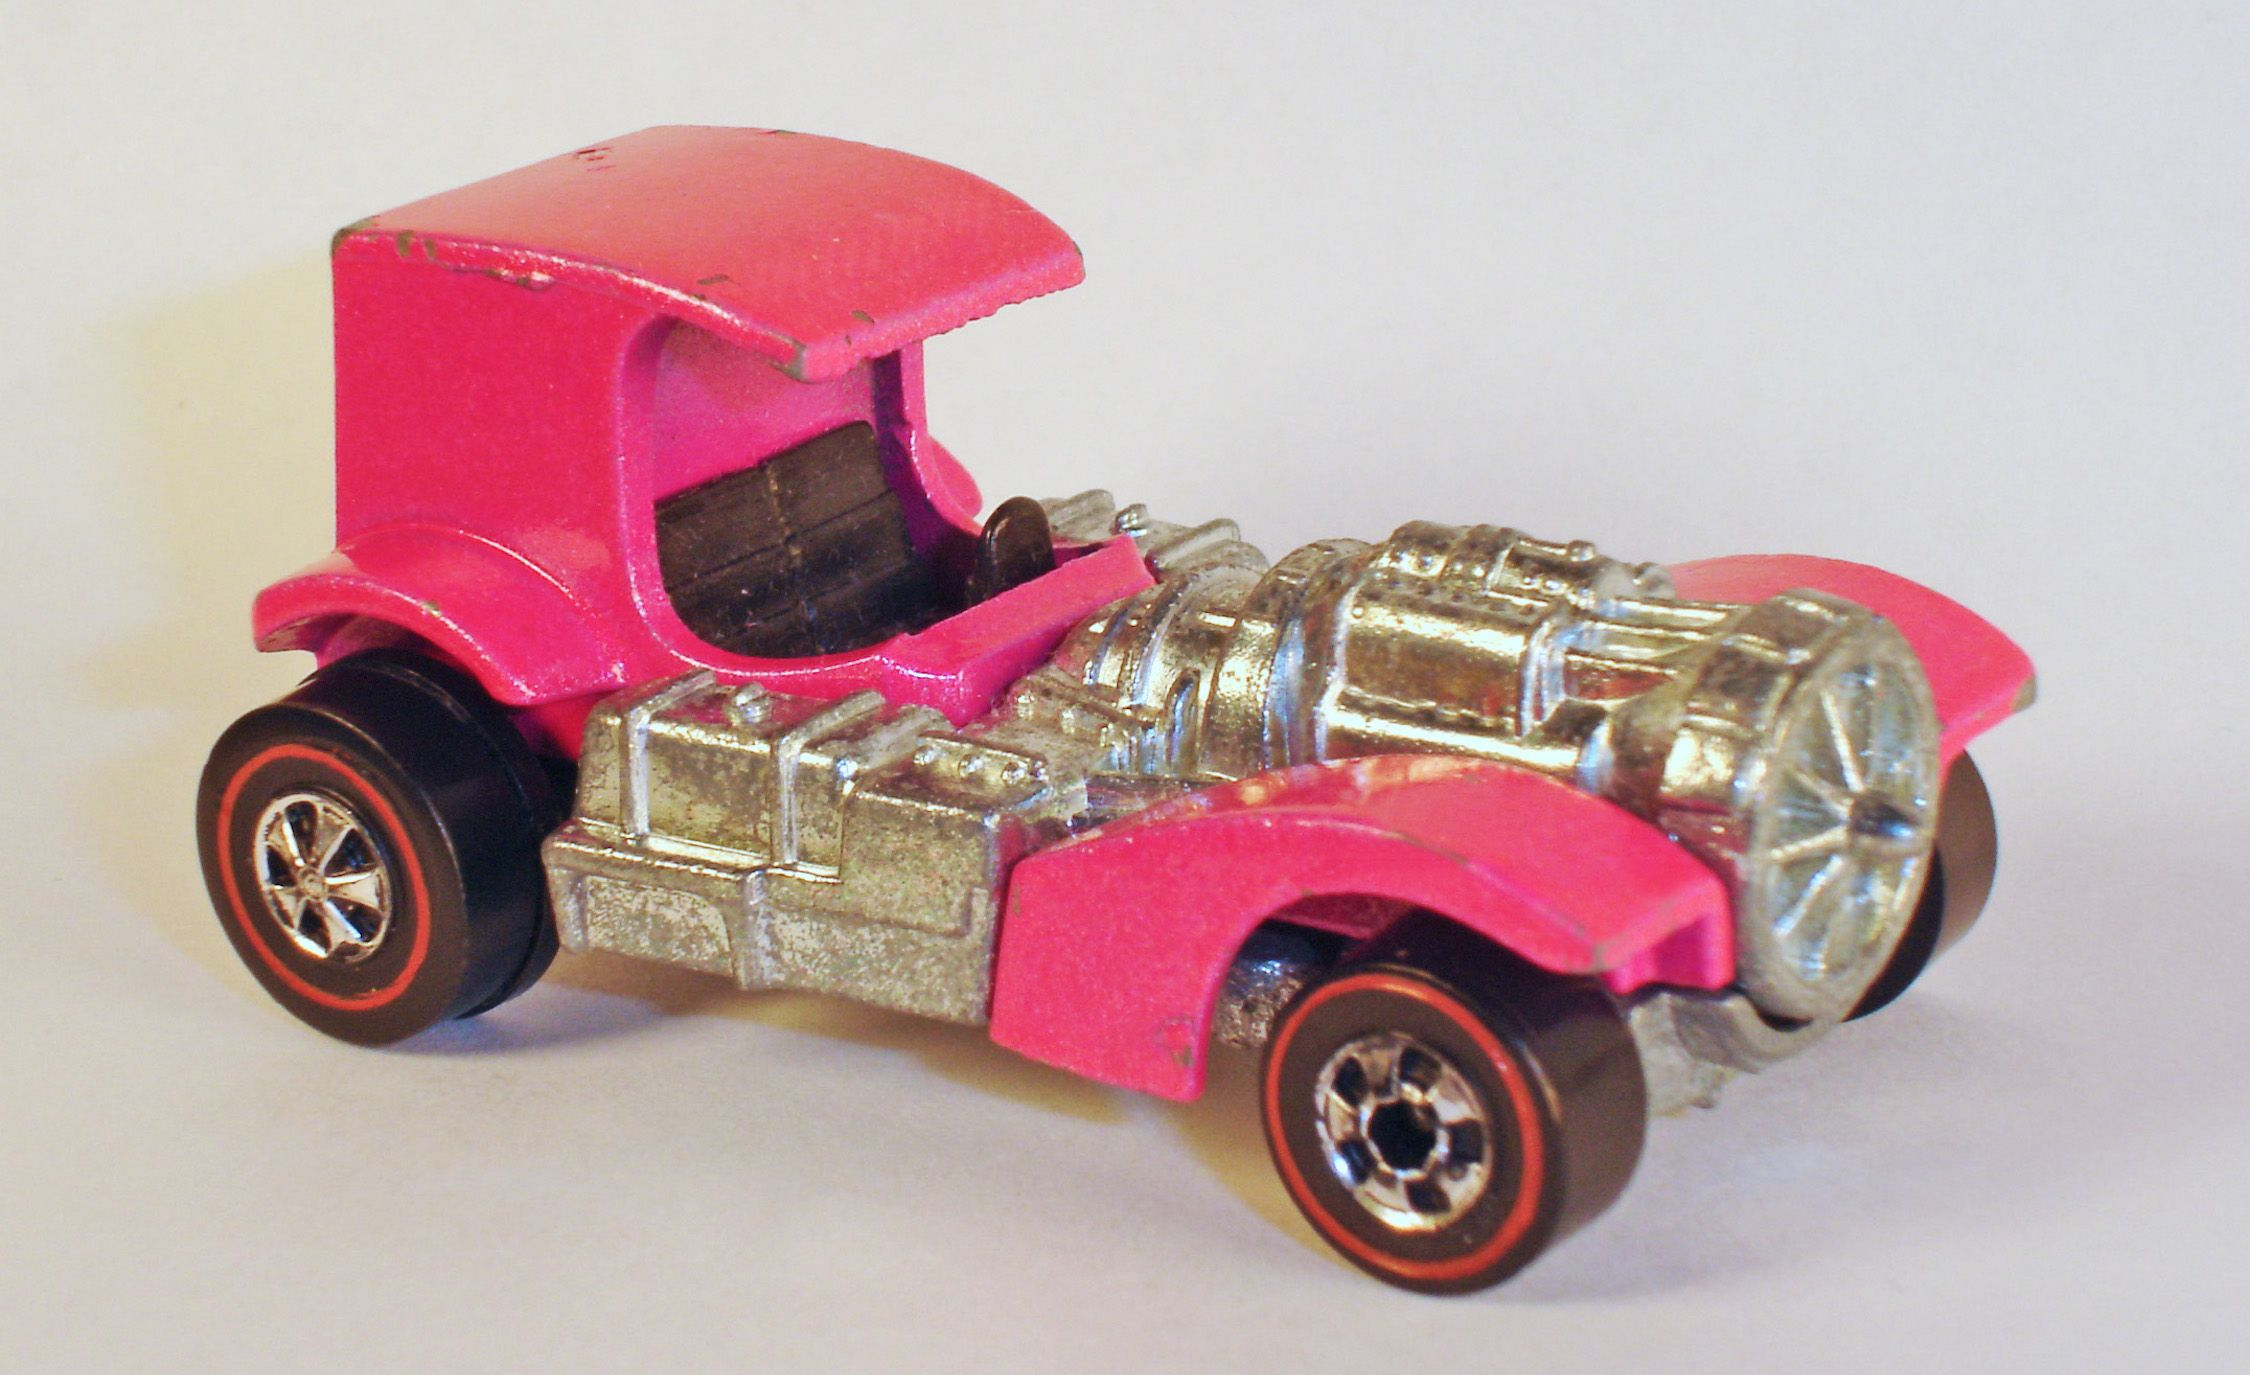 Hot-Wheels-Pink-Superfine-turbine